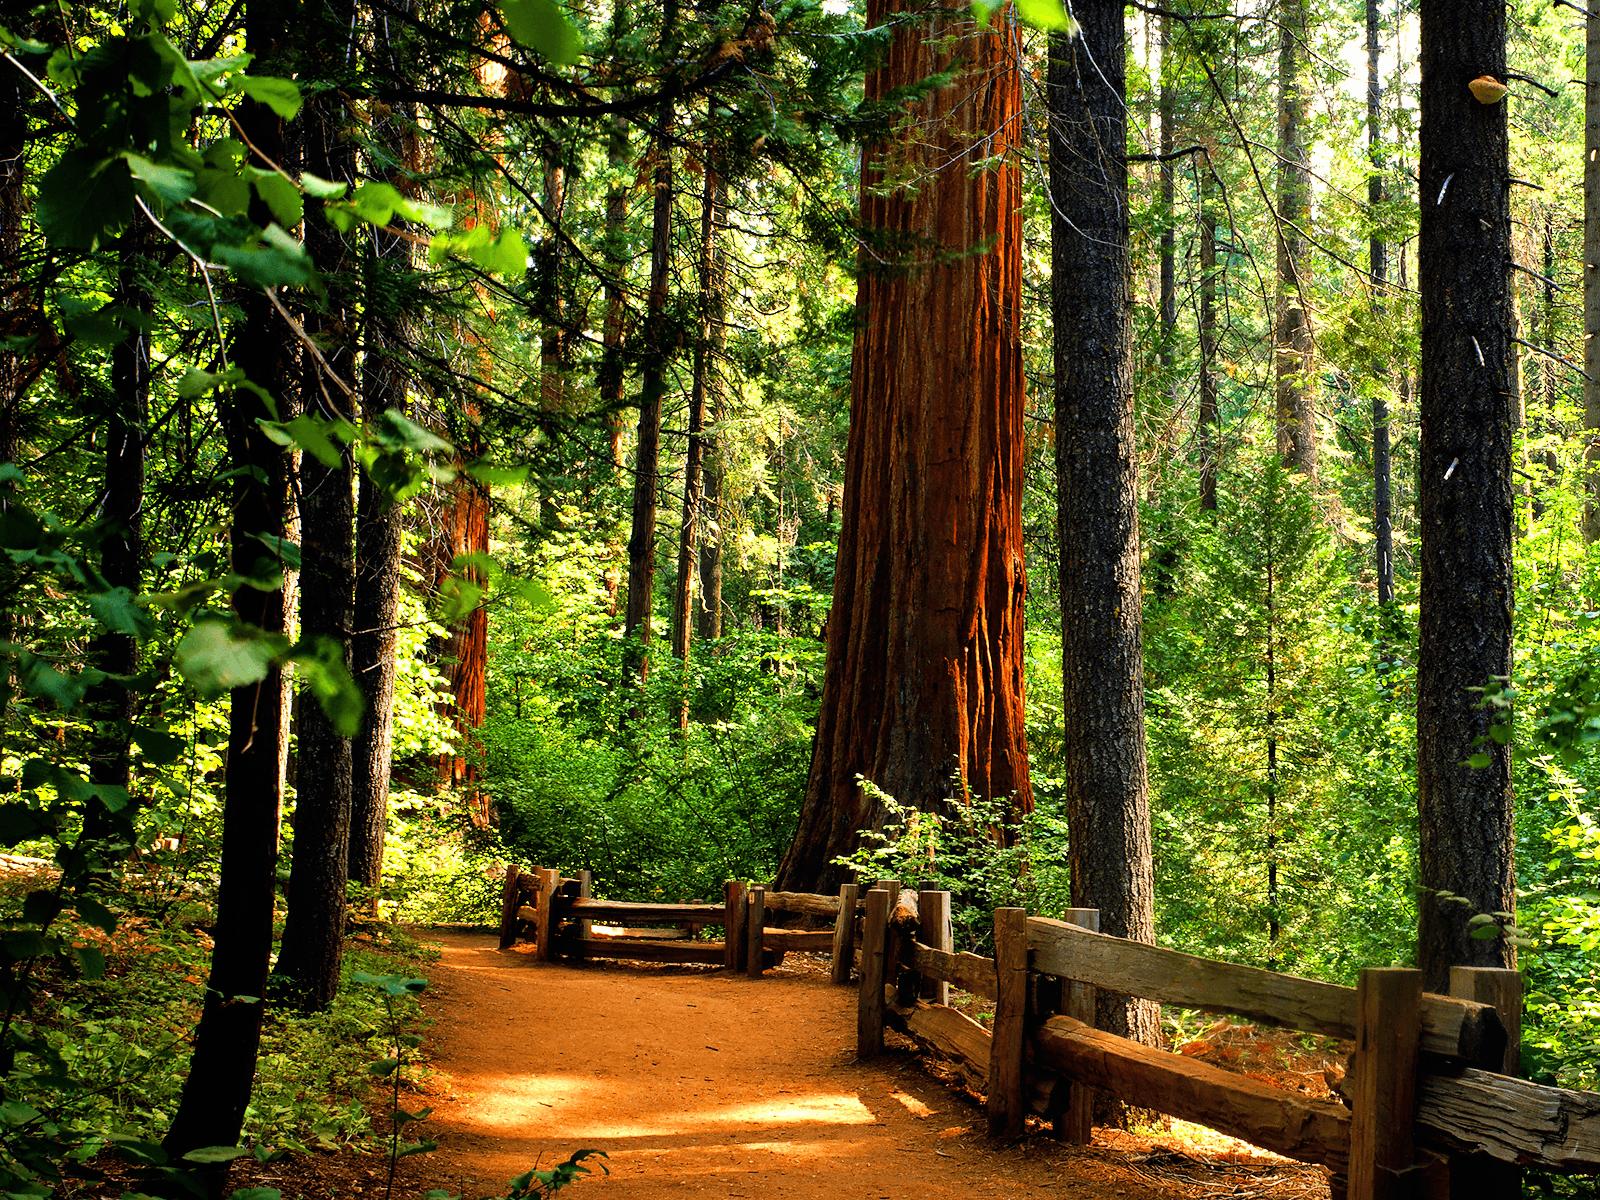 1600x1200 Redwoods Backgrounds And Wallpapers Wallpapersafari Giant Sequoia Trees Sequoia Tree Redwood Tree